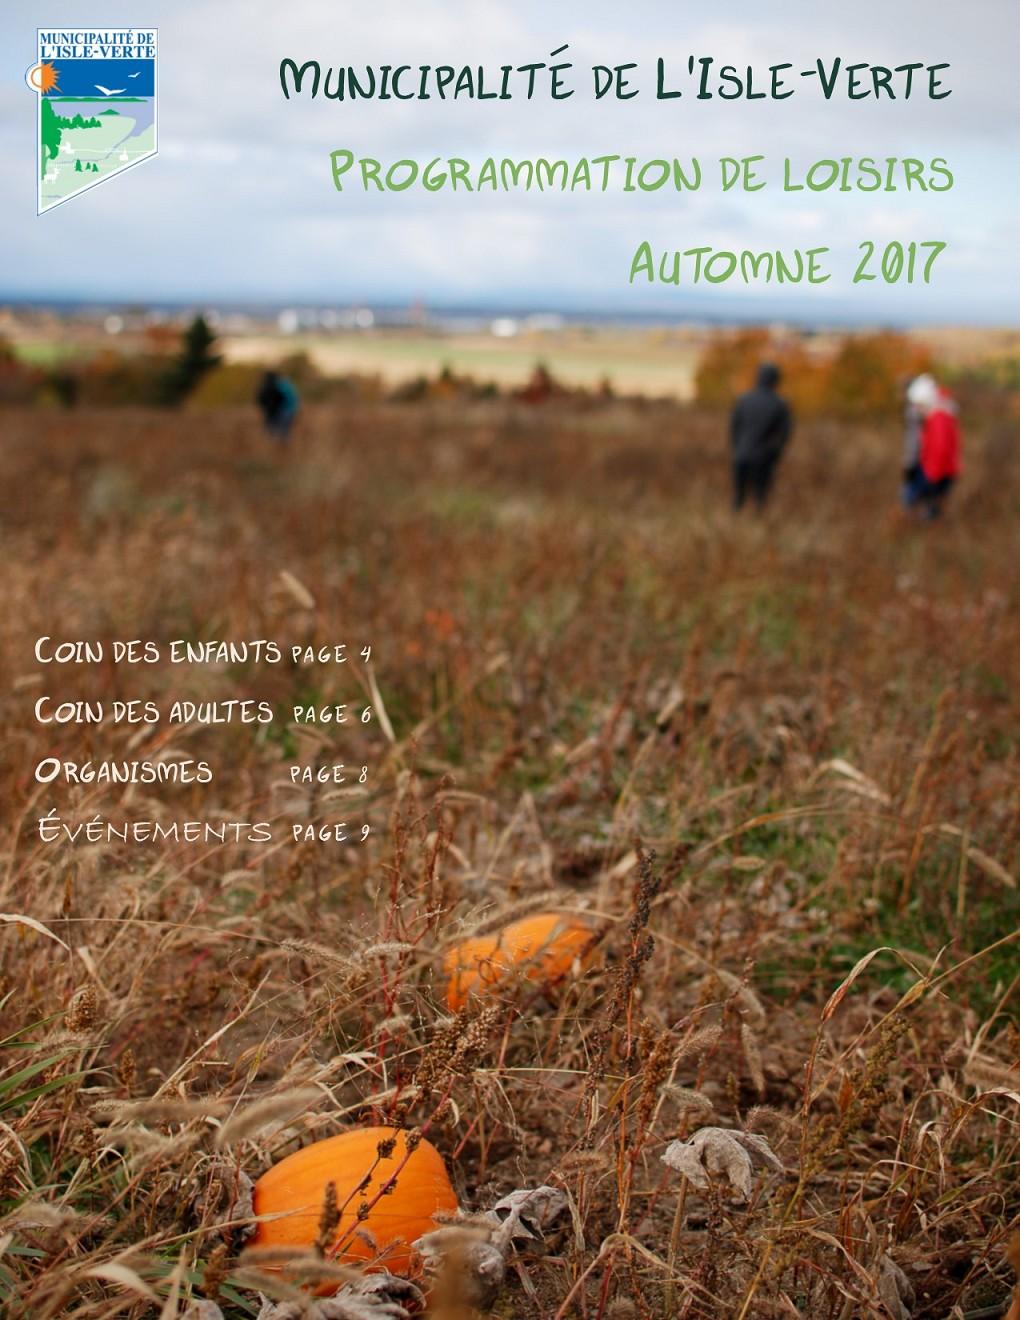 prog automne 2017 cover